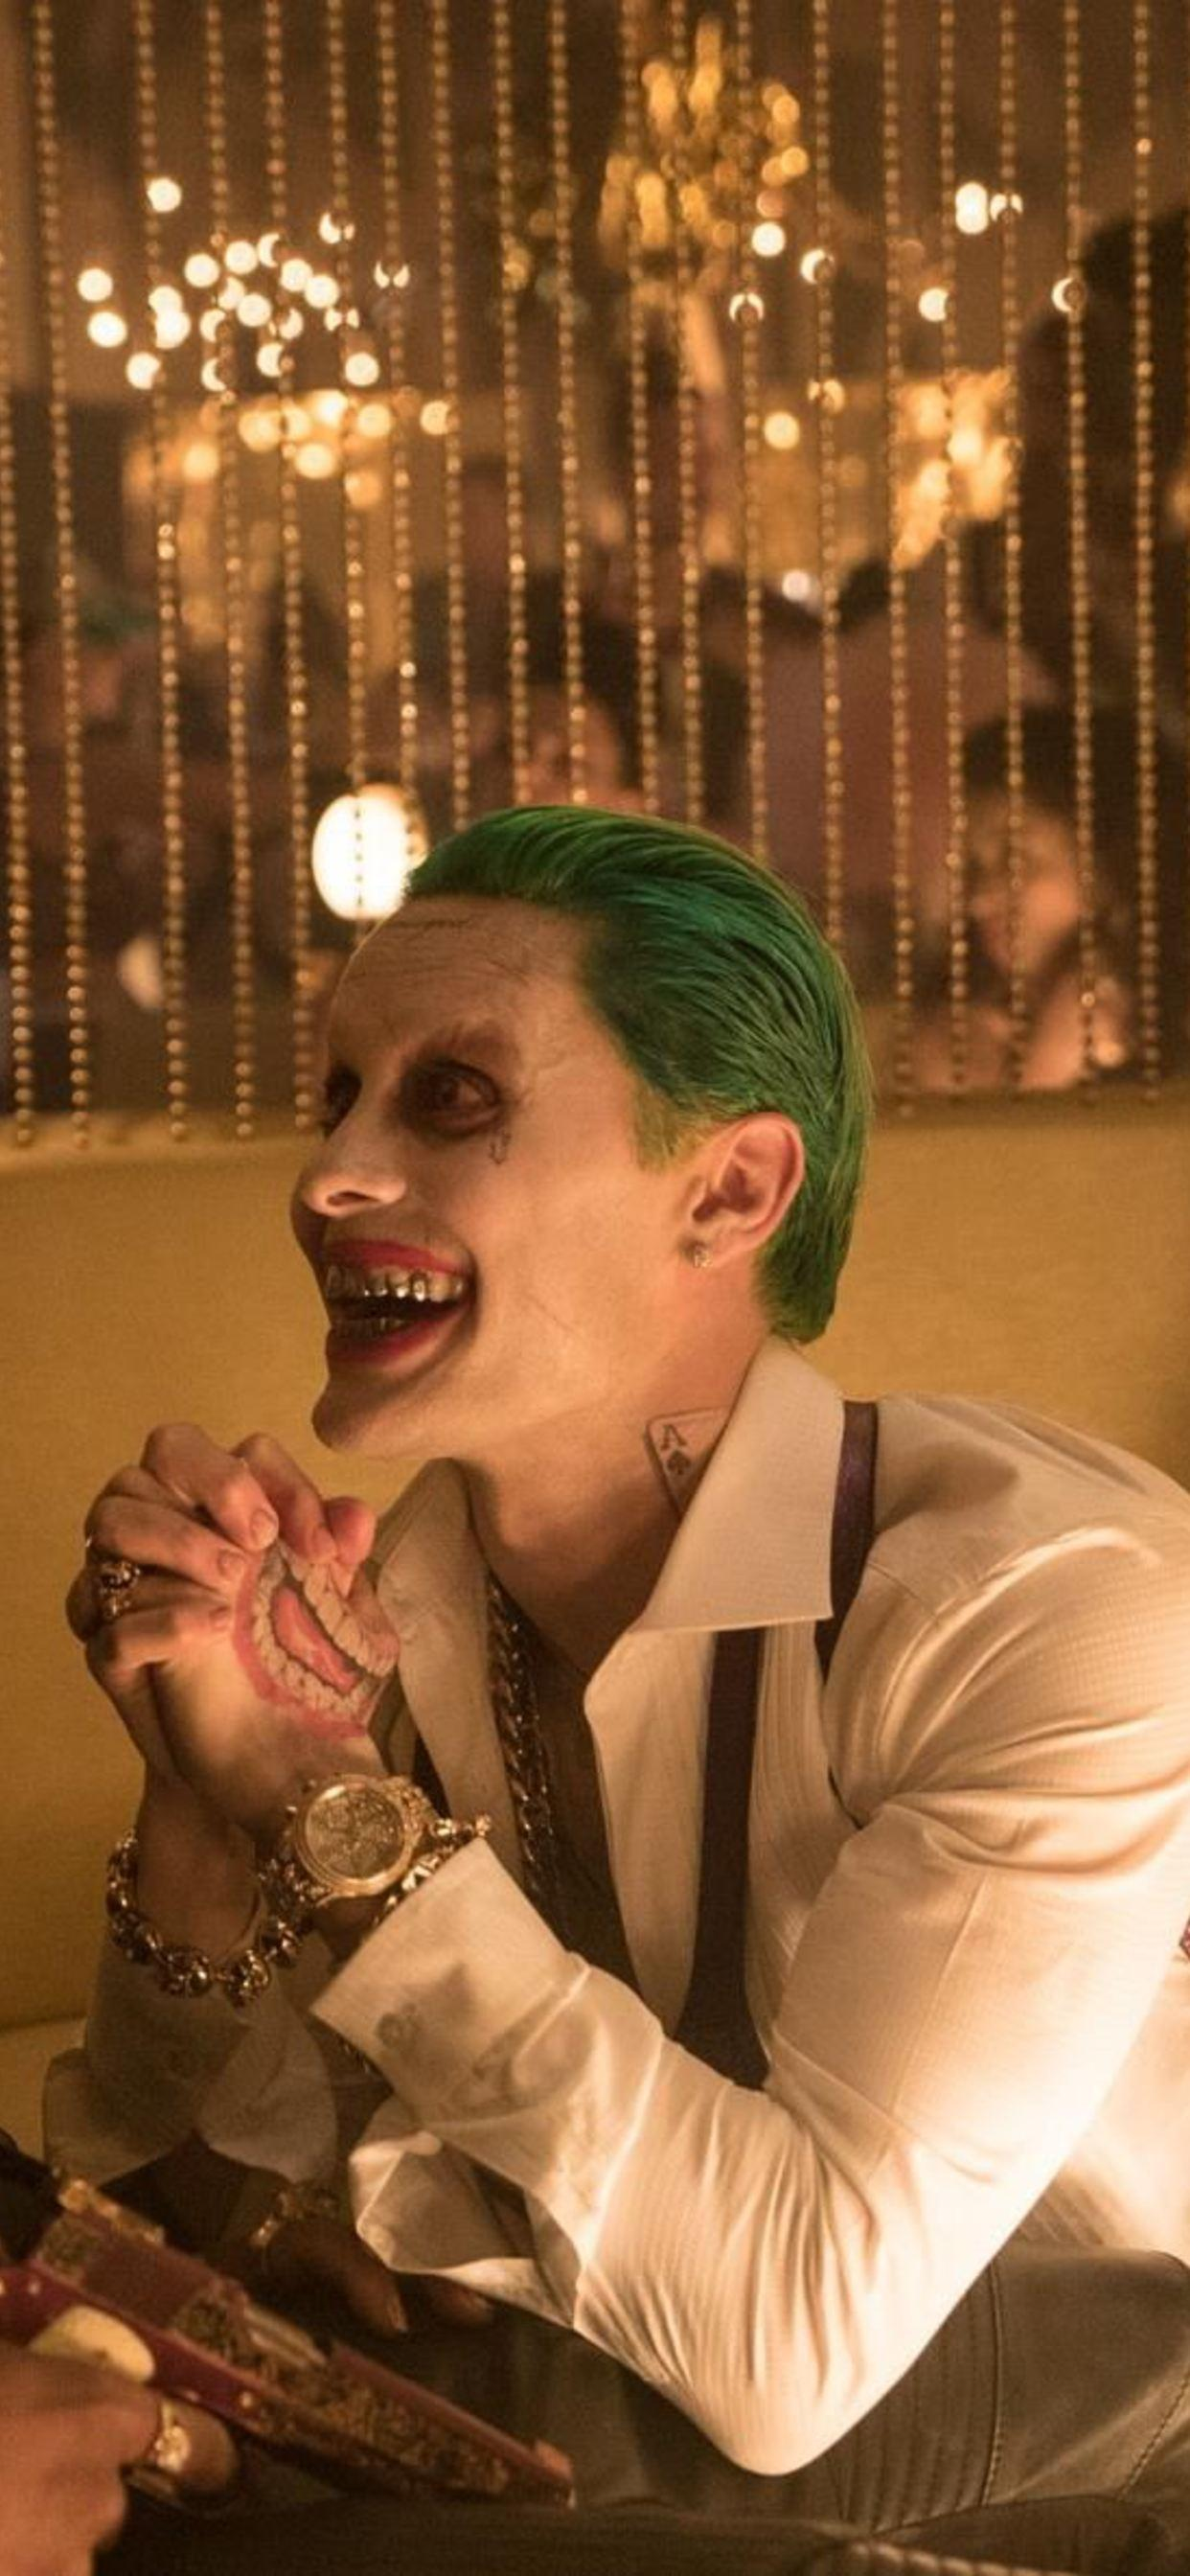 Suicide Squad Joker Iphone Wallpapers Wallpaper Cave